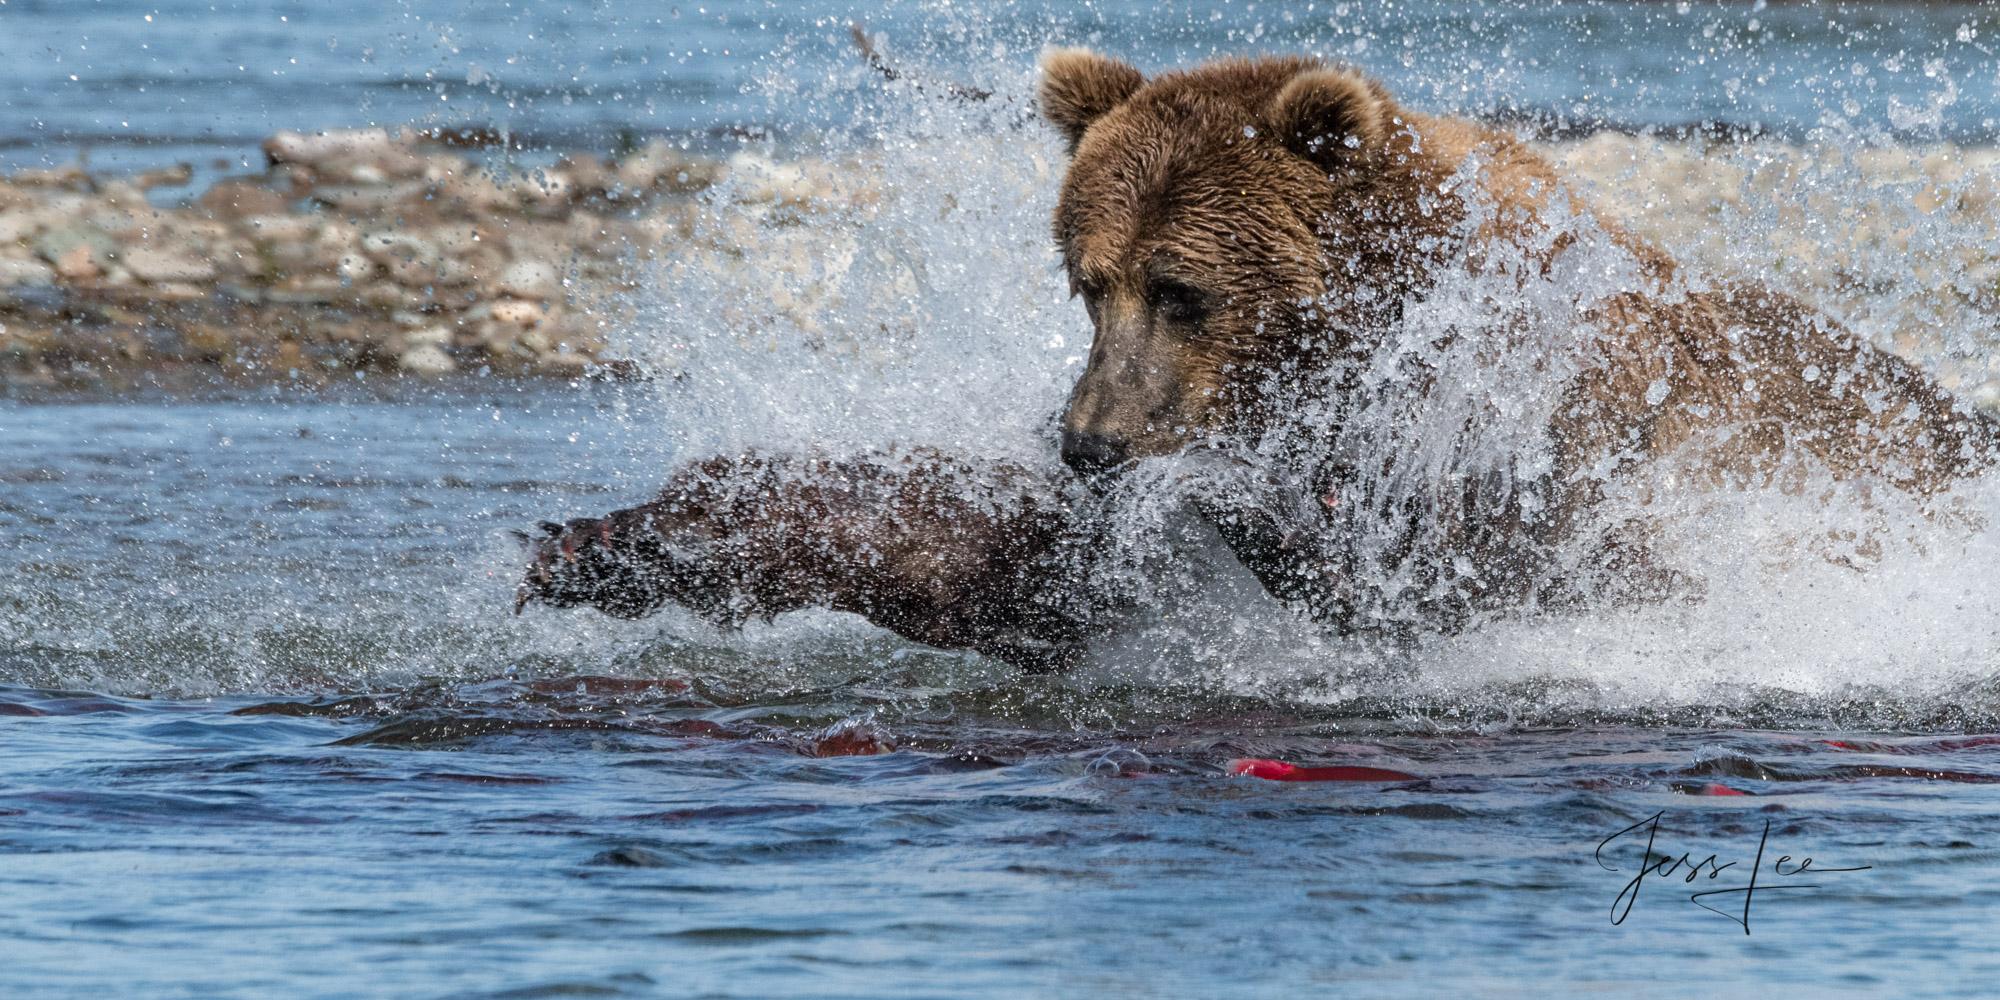 Grizzly, brown bear, bear, Alaska, Coastal, salmon. fishing, photo